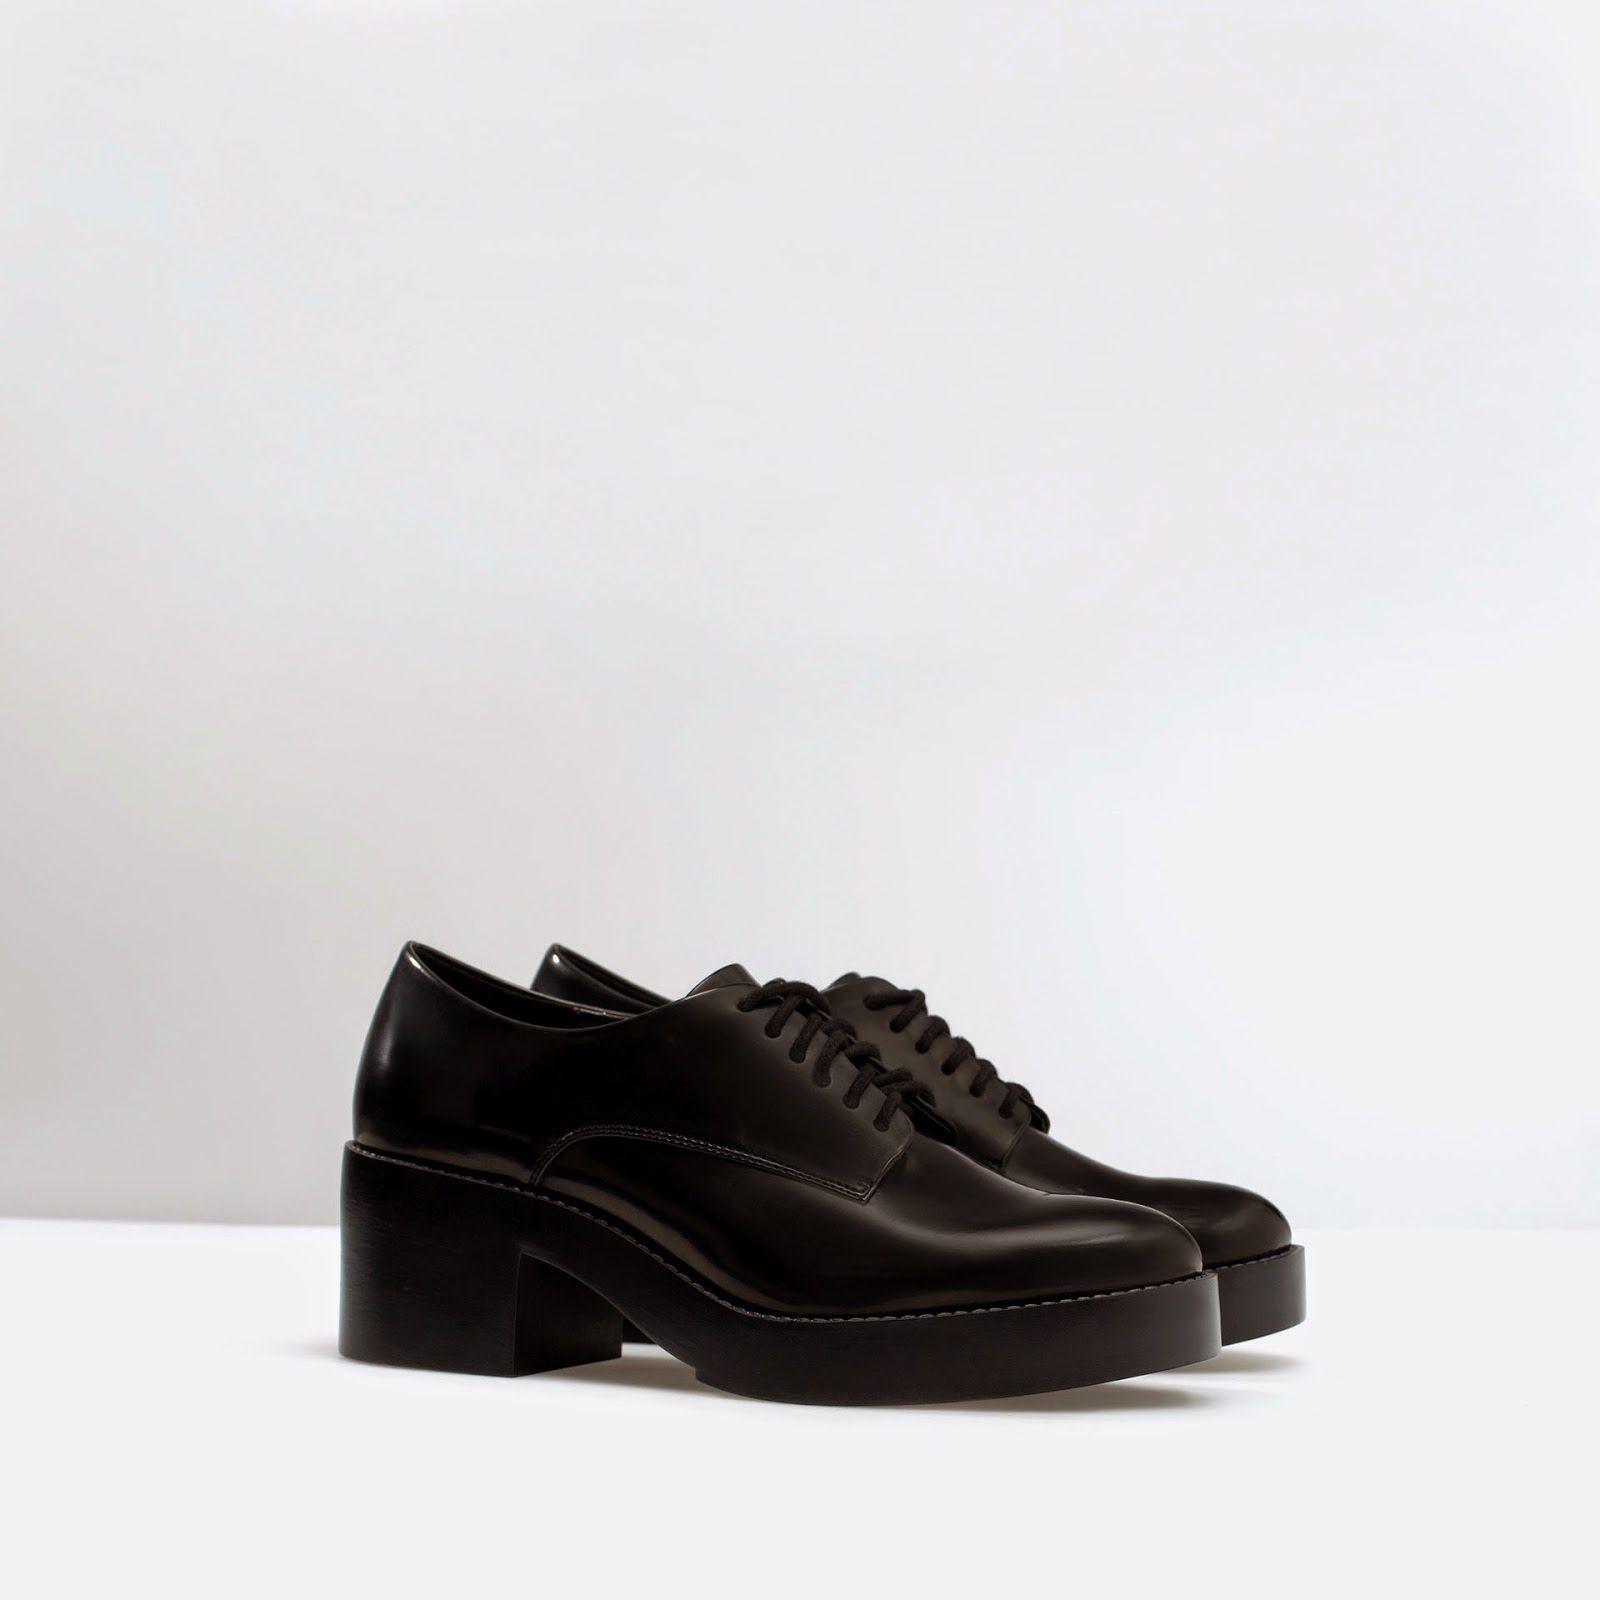 Zara Platform Blucher Review   Shoes